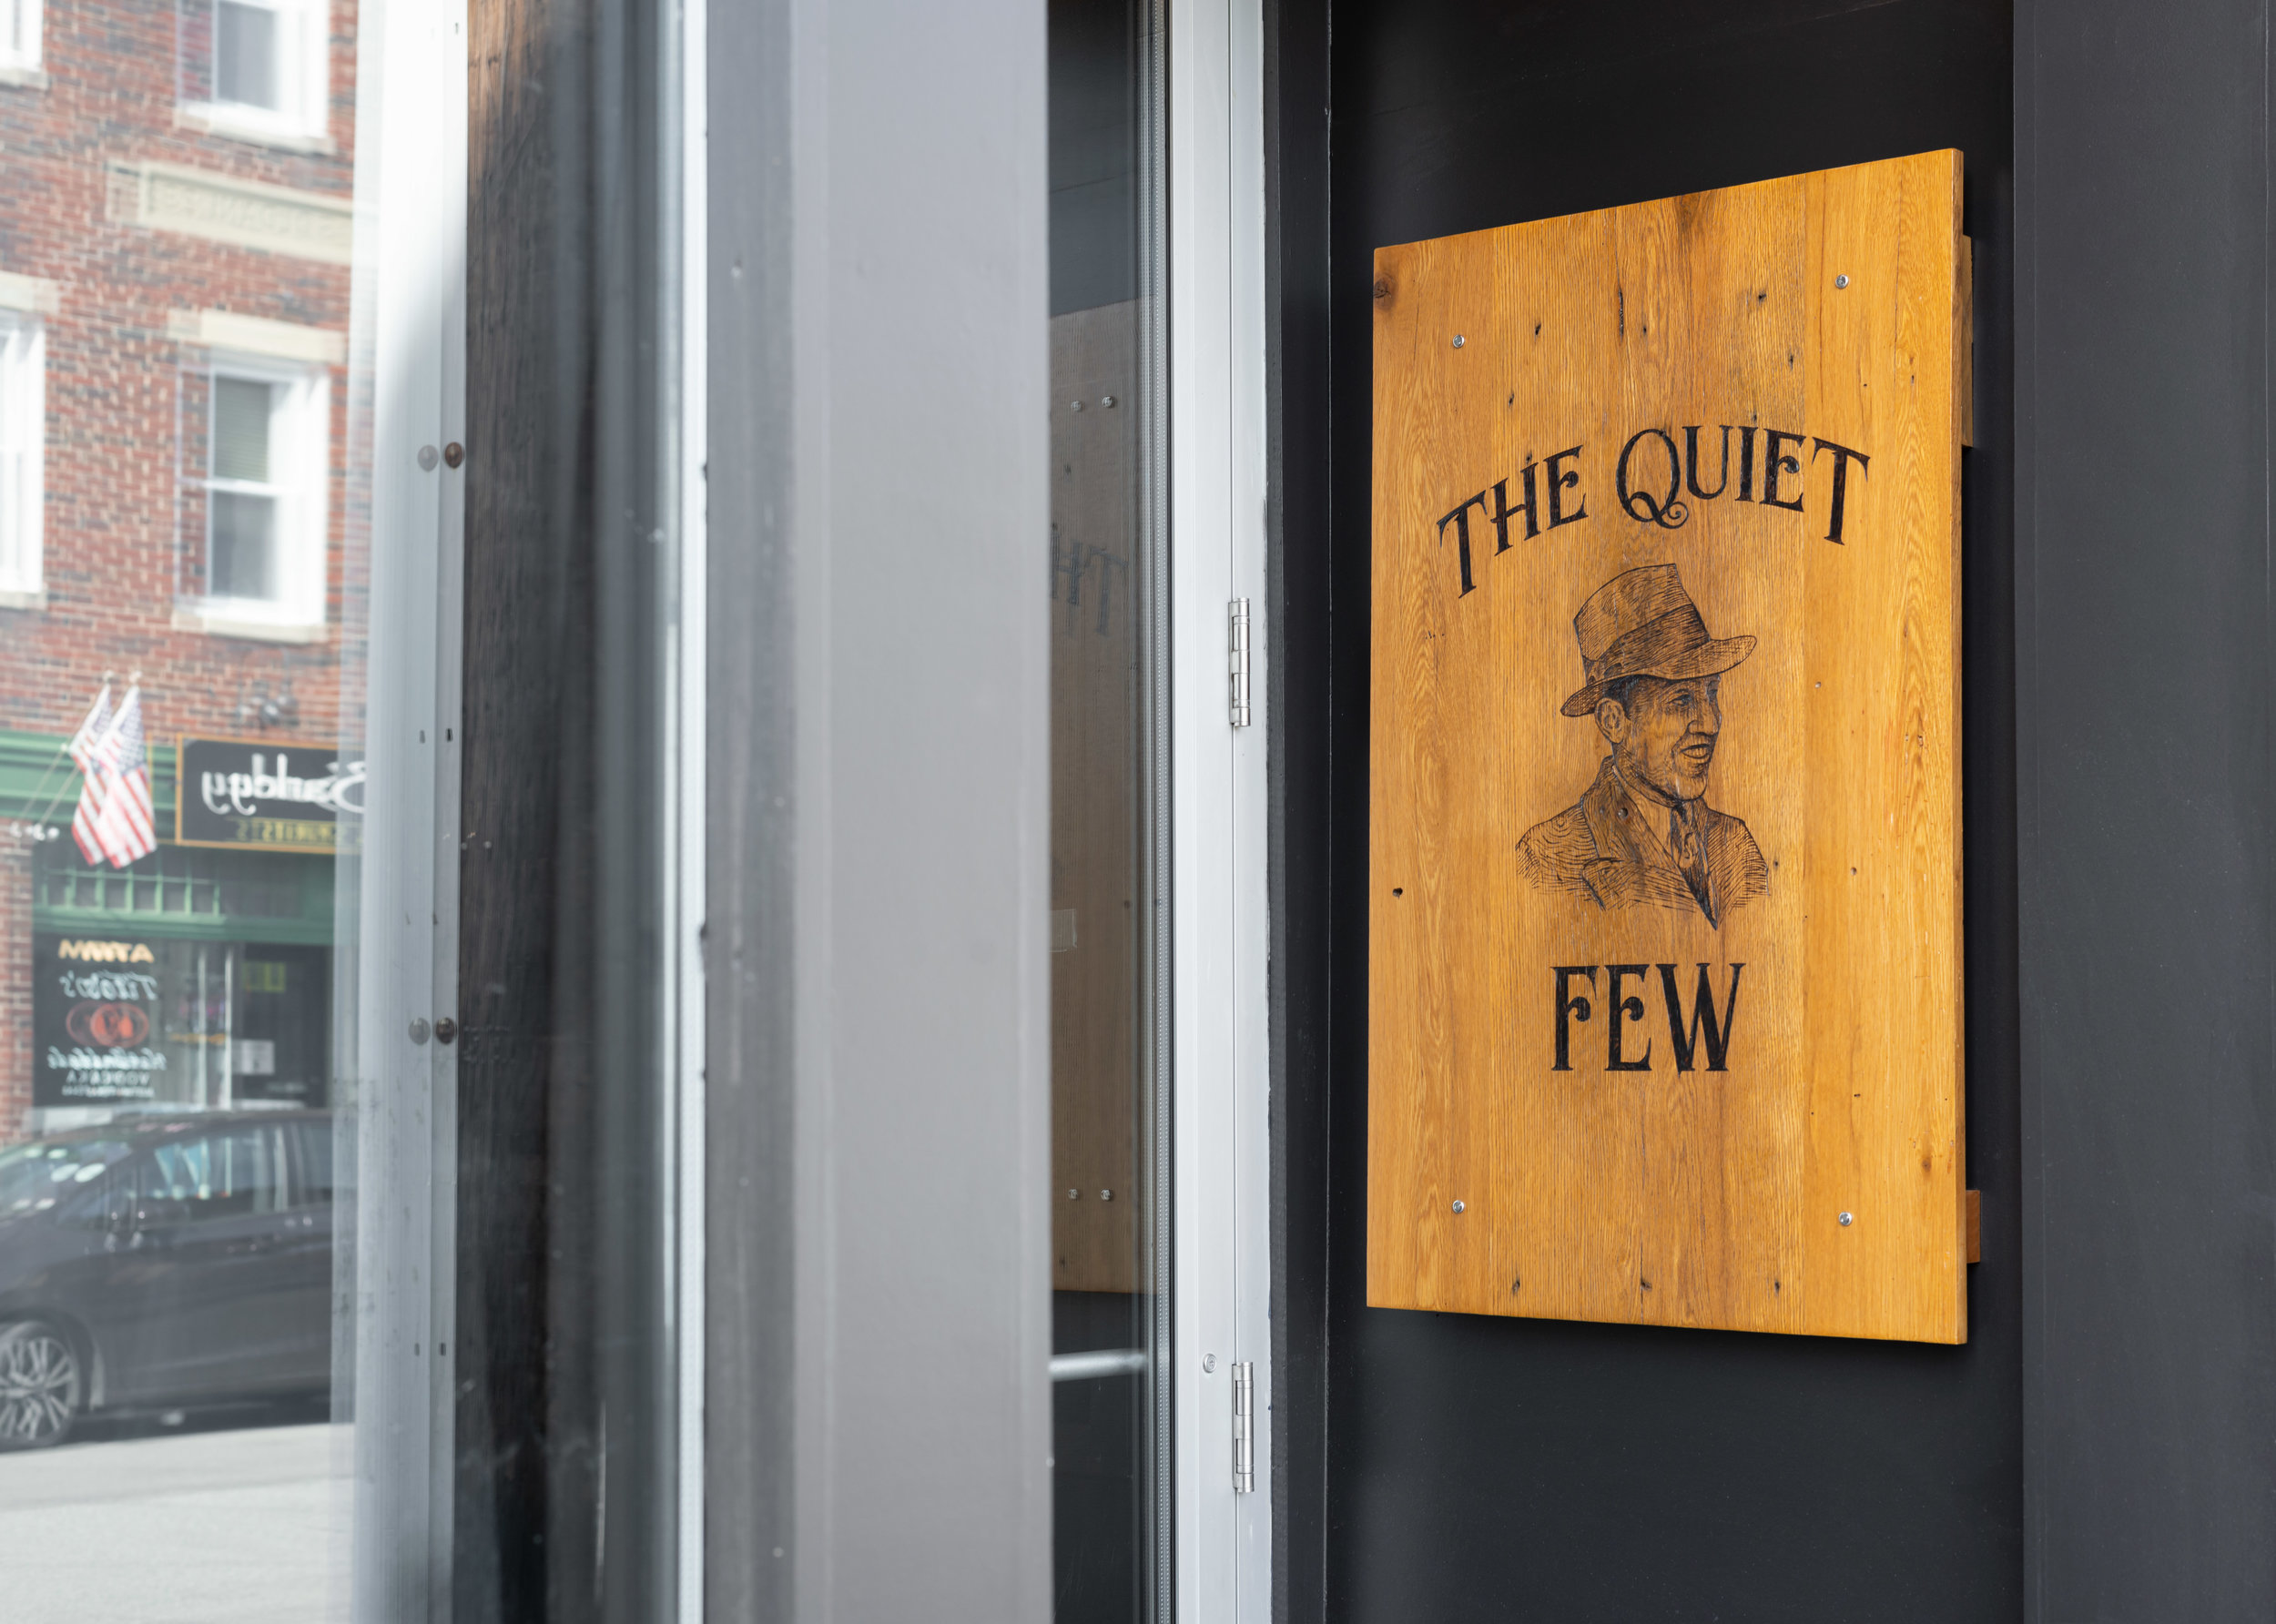 QuietFew-1.jpg